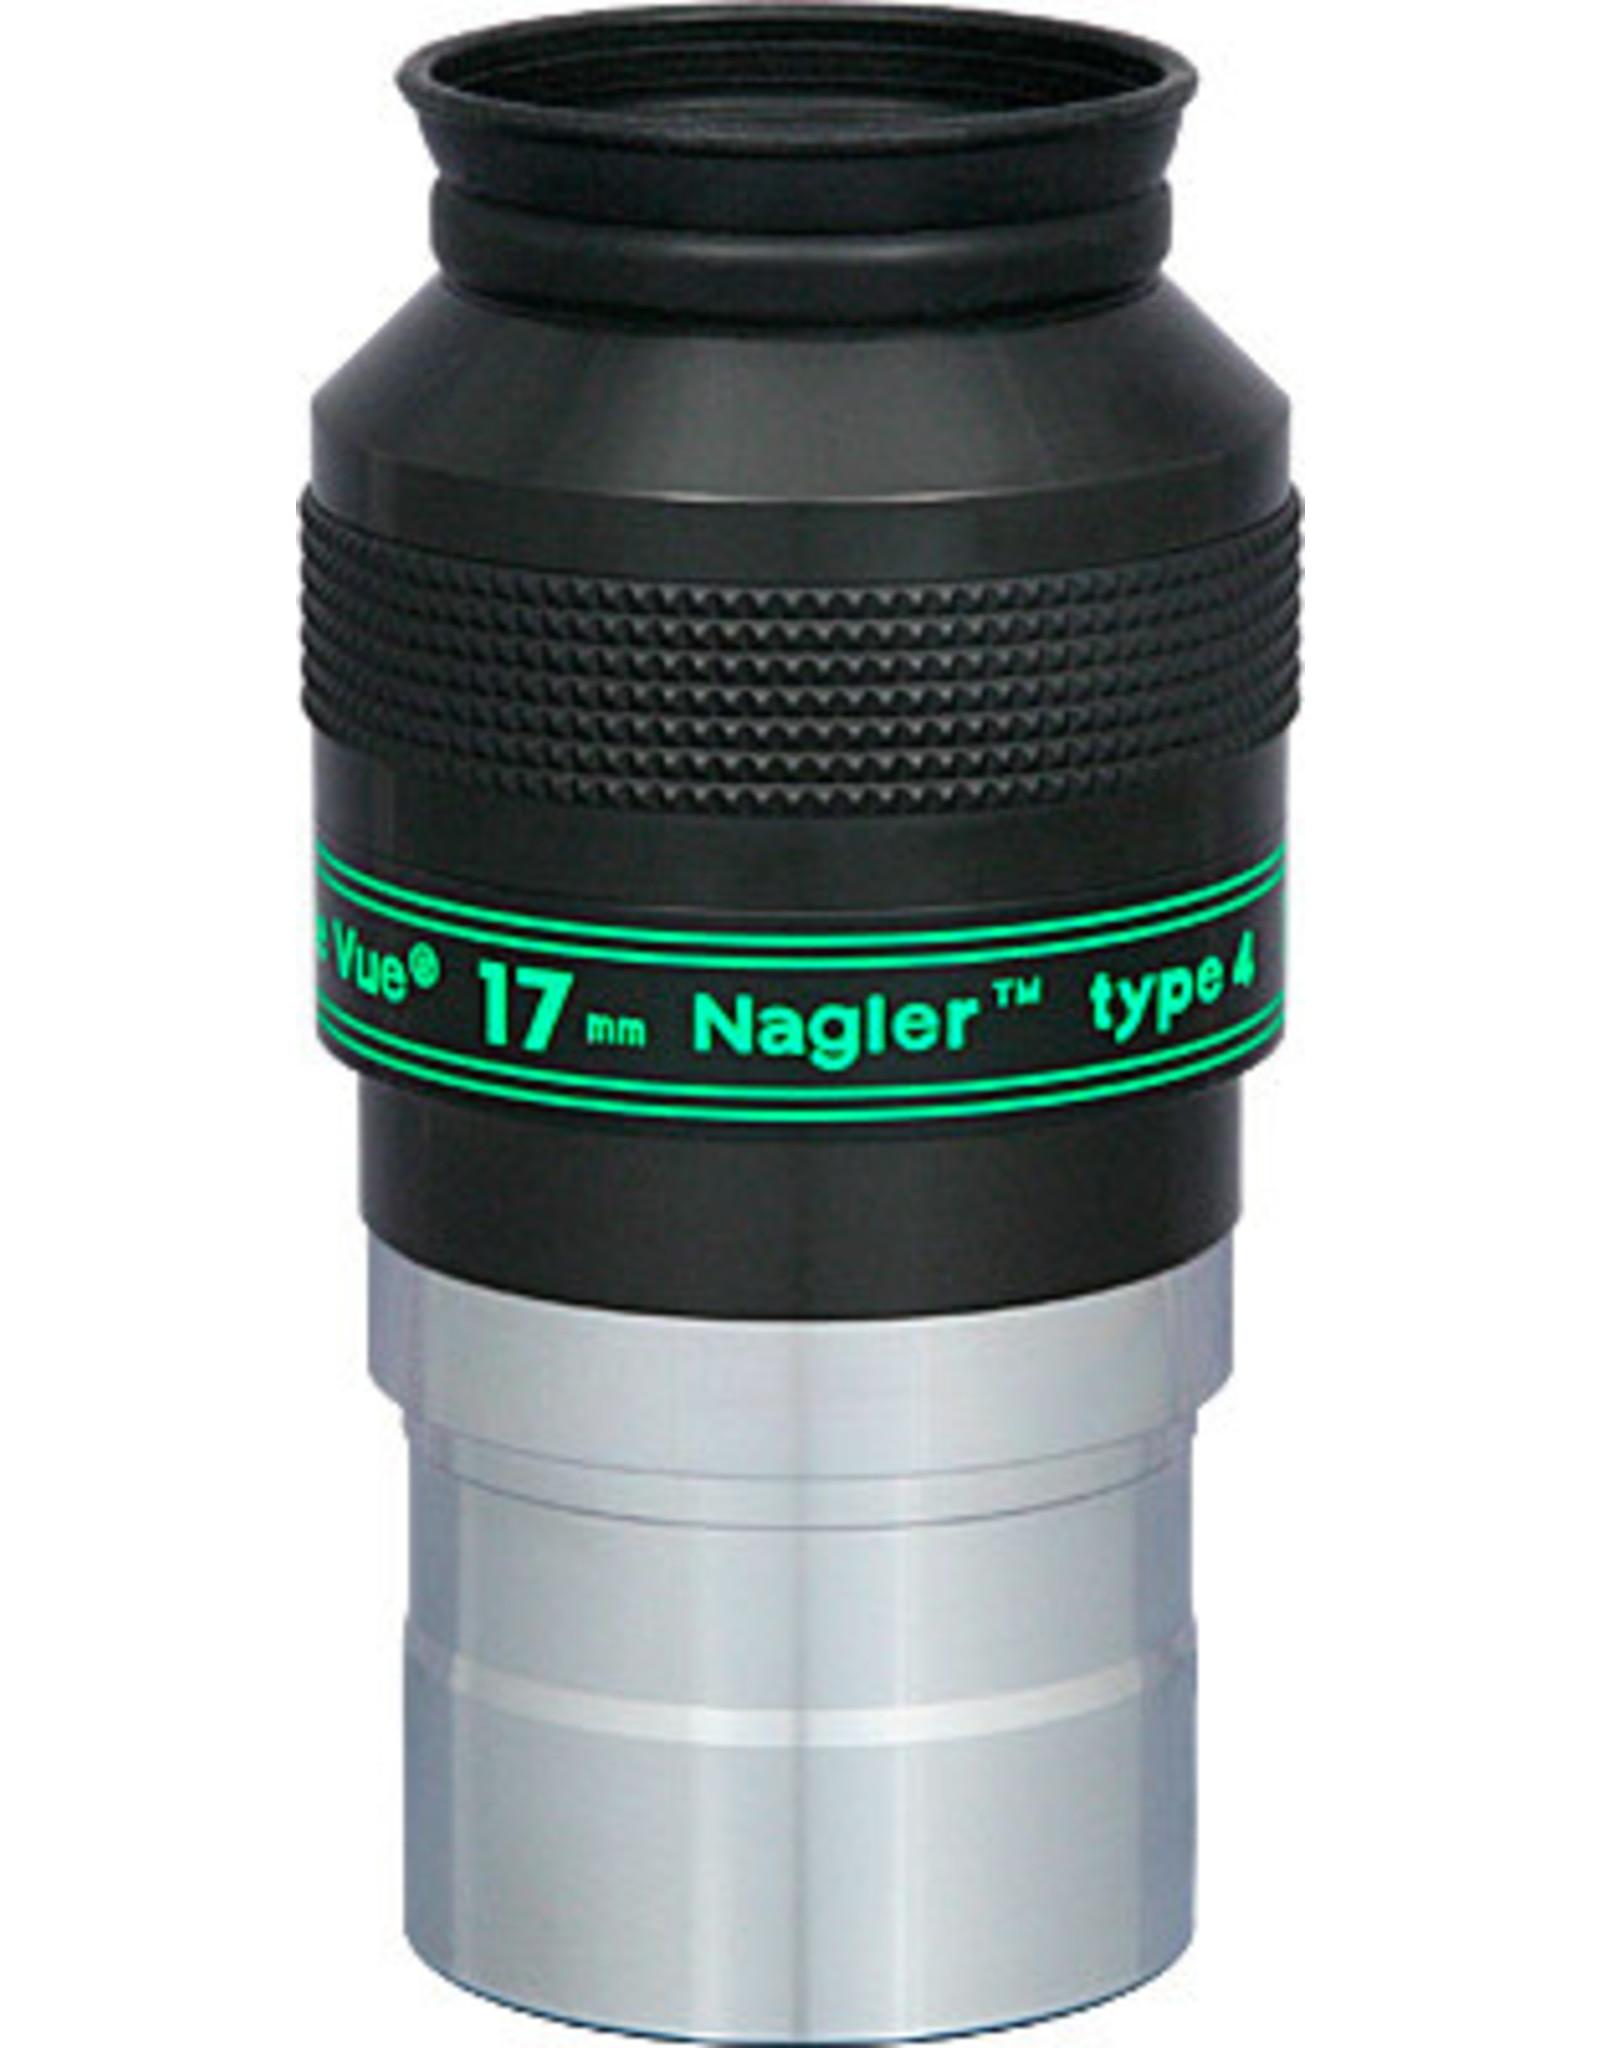 Tele Vue 17mm Nagler Type 4 Eyepiece - 2